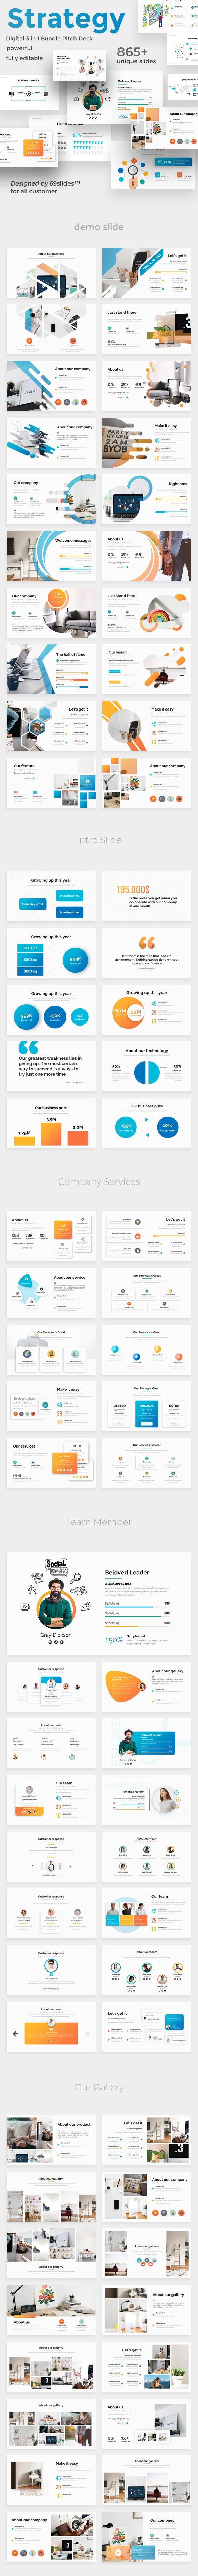 Digital Strategy 3 in 1 Pitch Deck Keynote Bundle Template - Business Keynote Templates